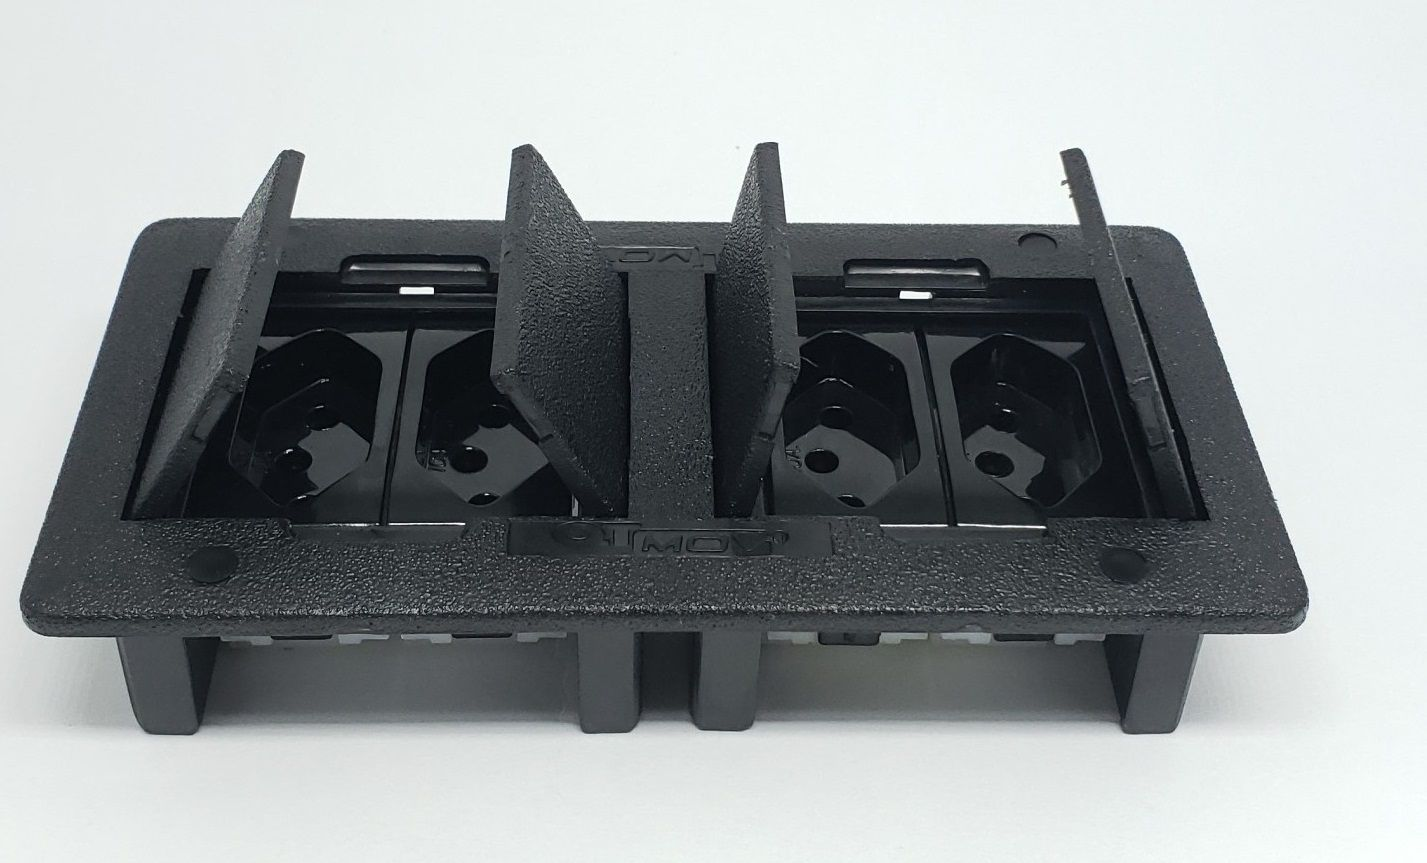 CAIXA DE EMBUTIR - ABS 4 BLOCOS c/ 4 tomadas elétricas